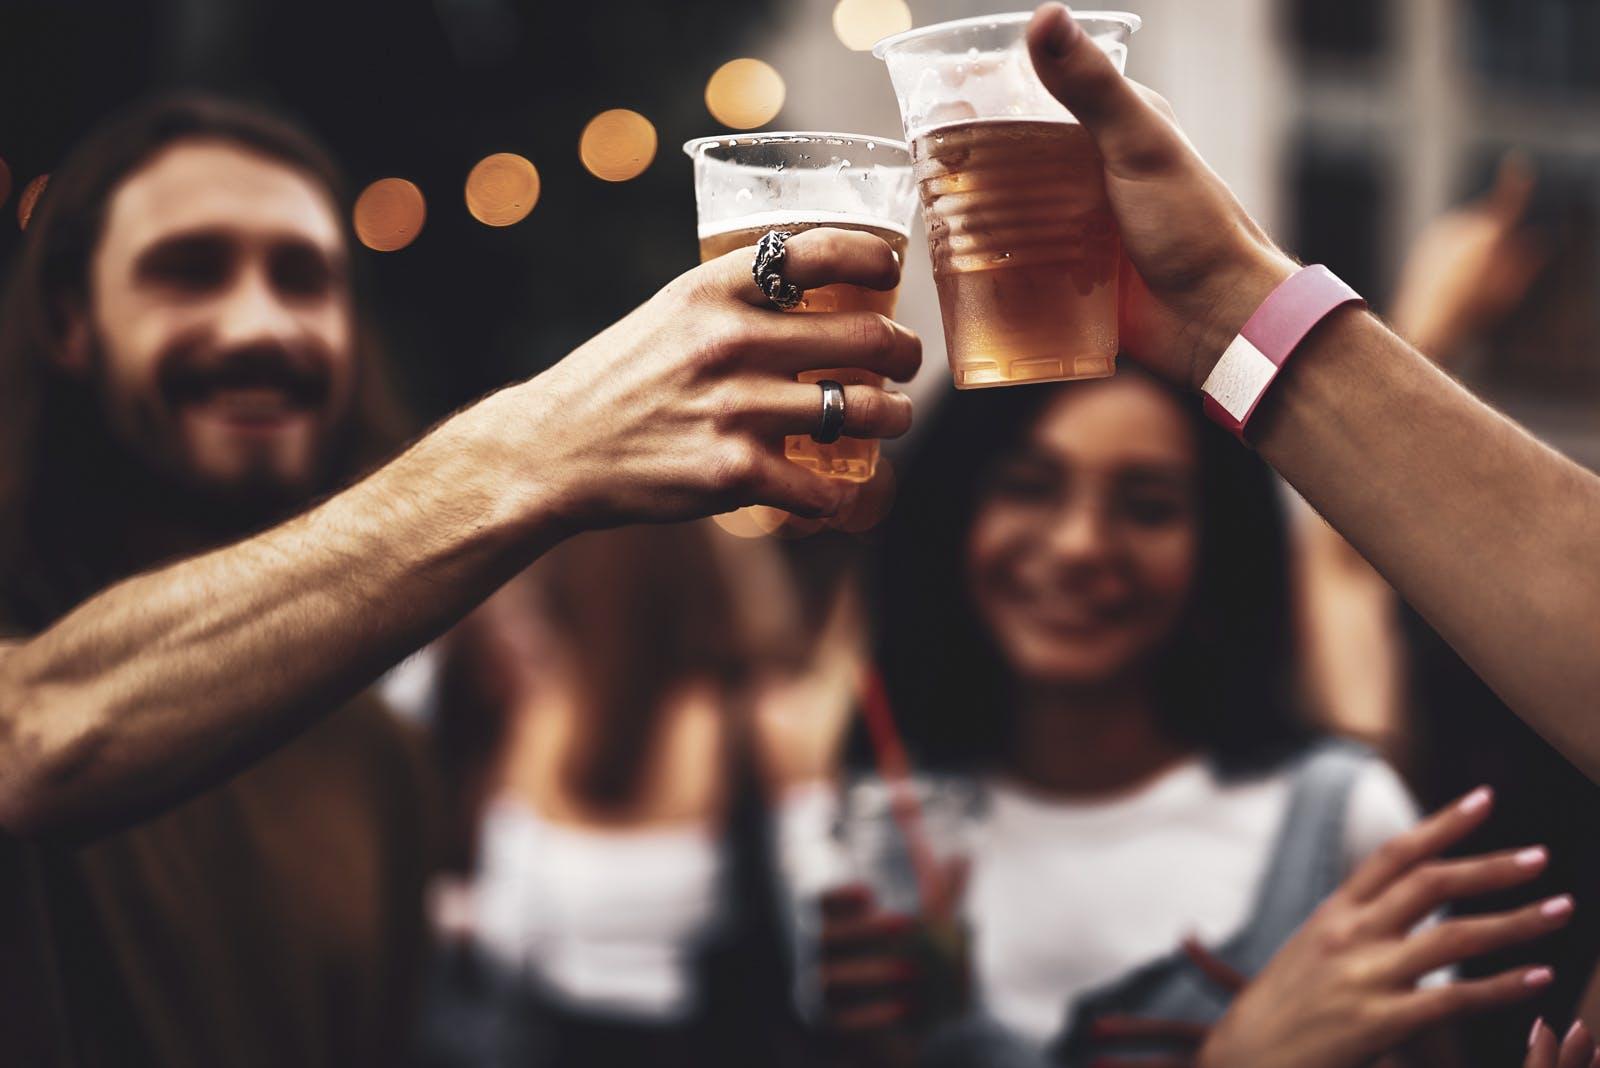 Friends raising cups of beer